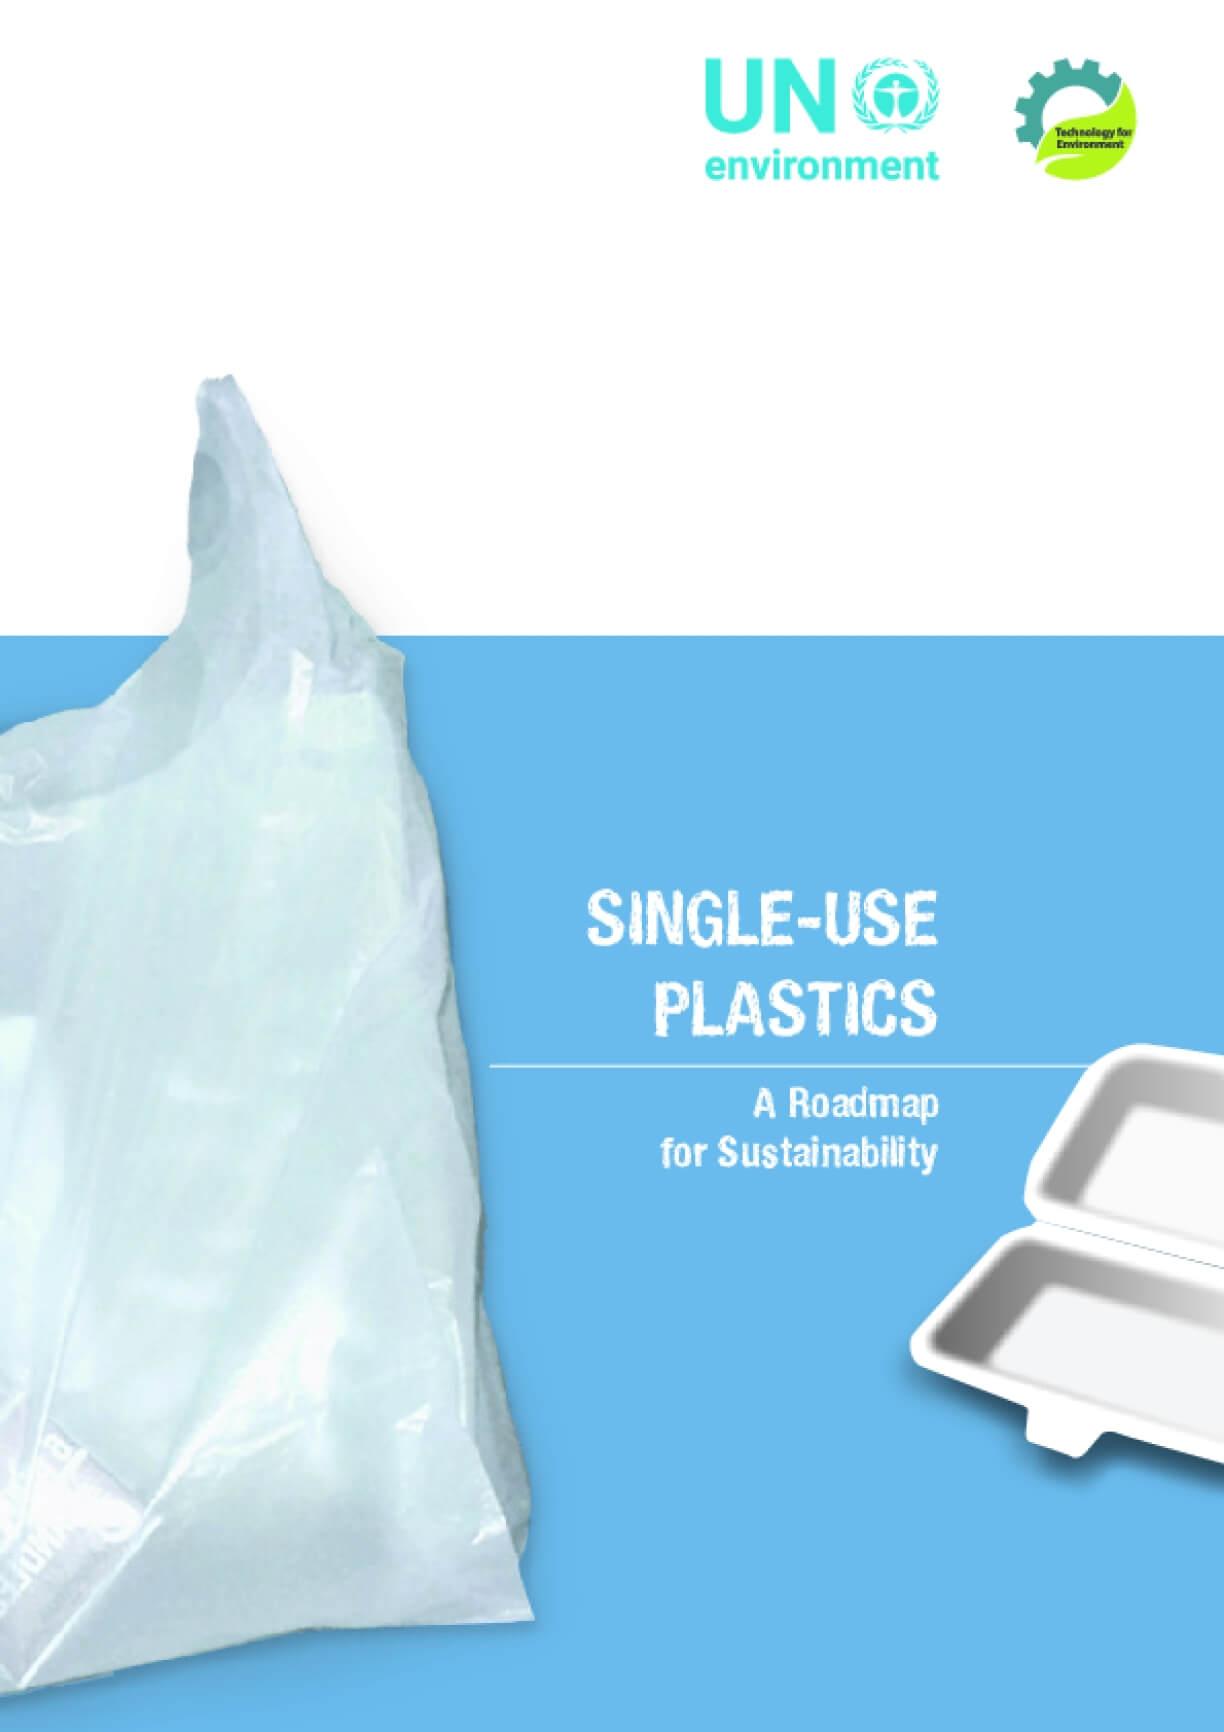 Single-Use Plastics: A Roadmap for Sustainability